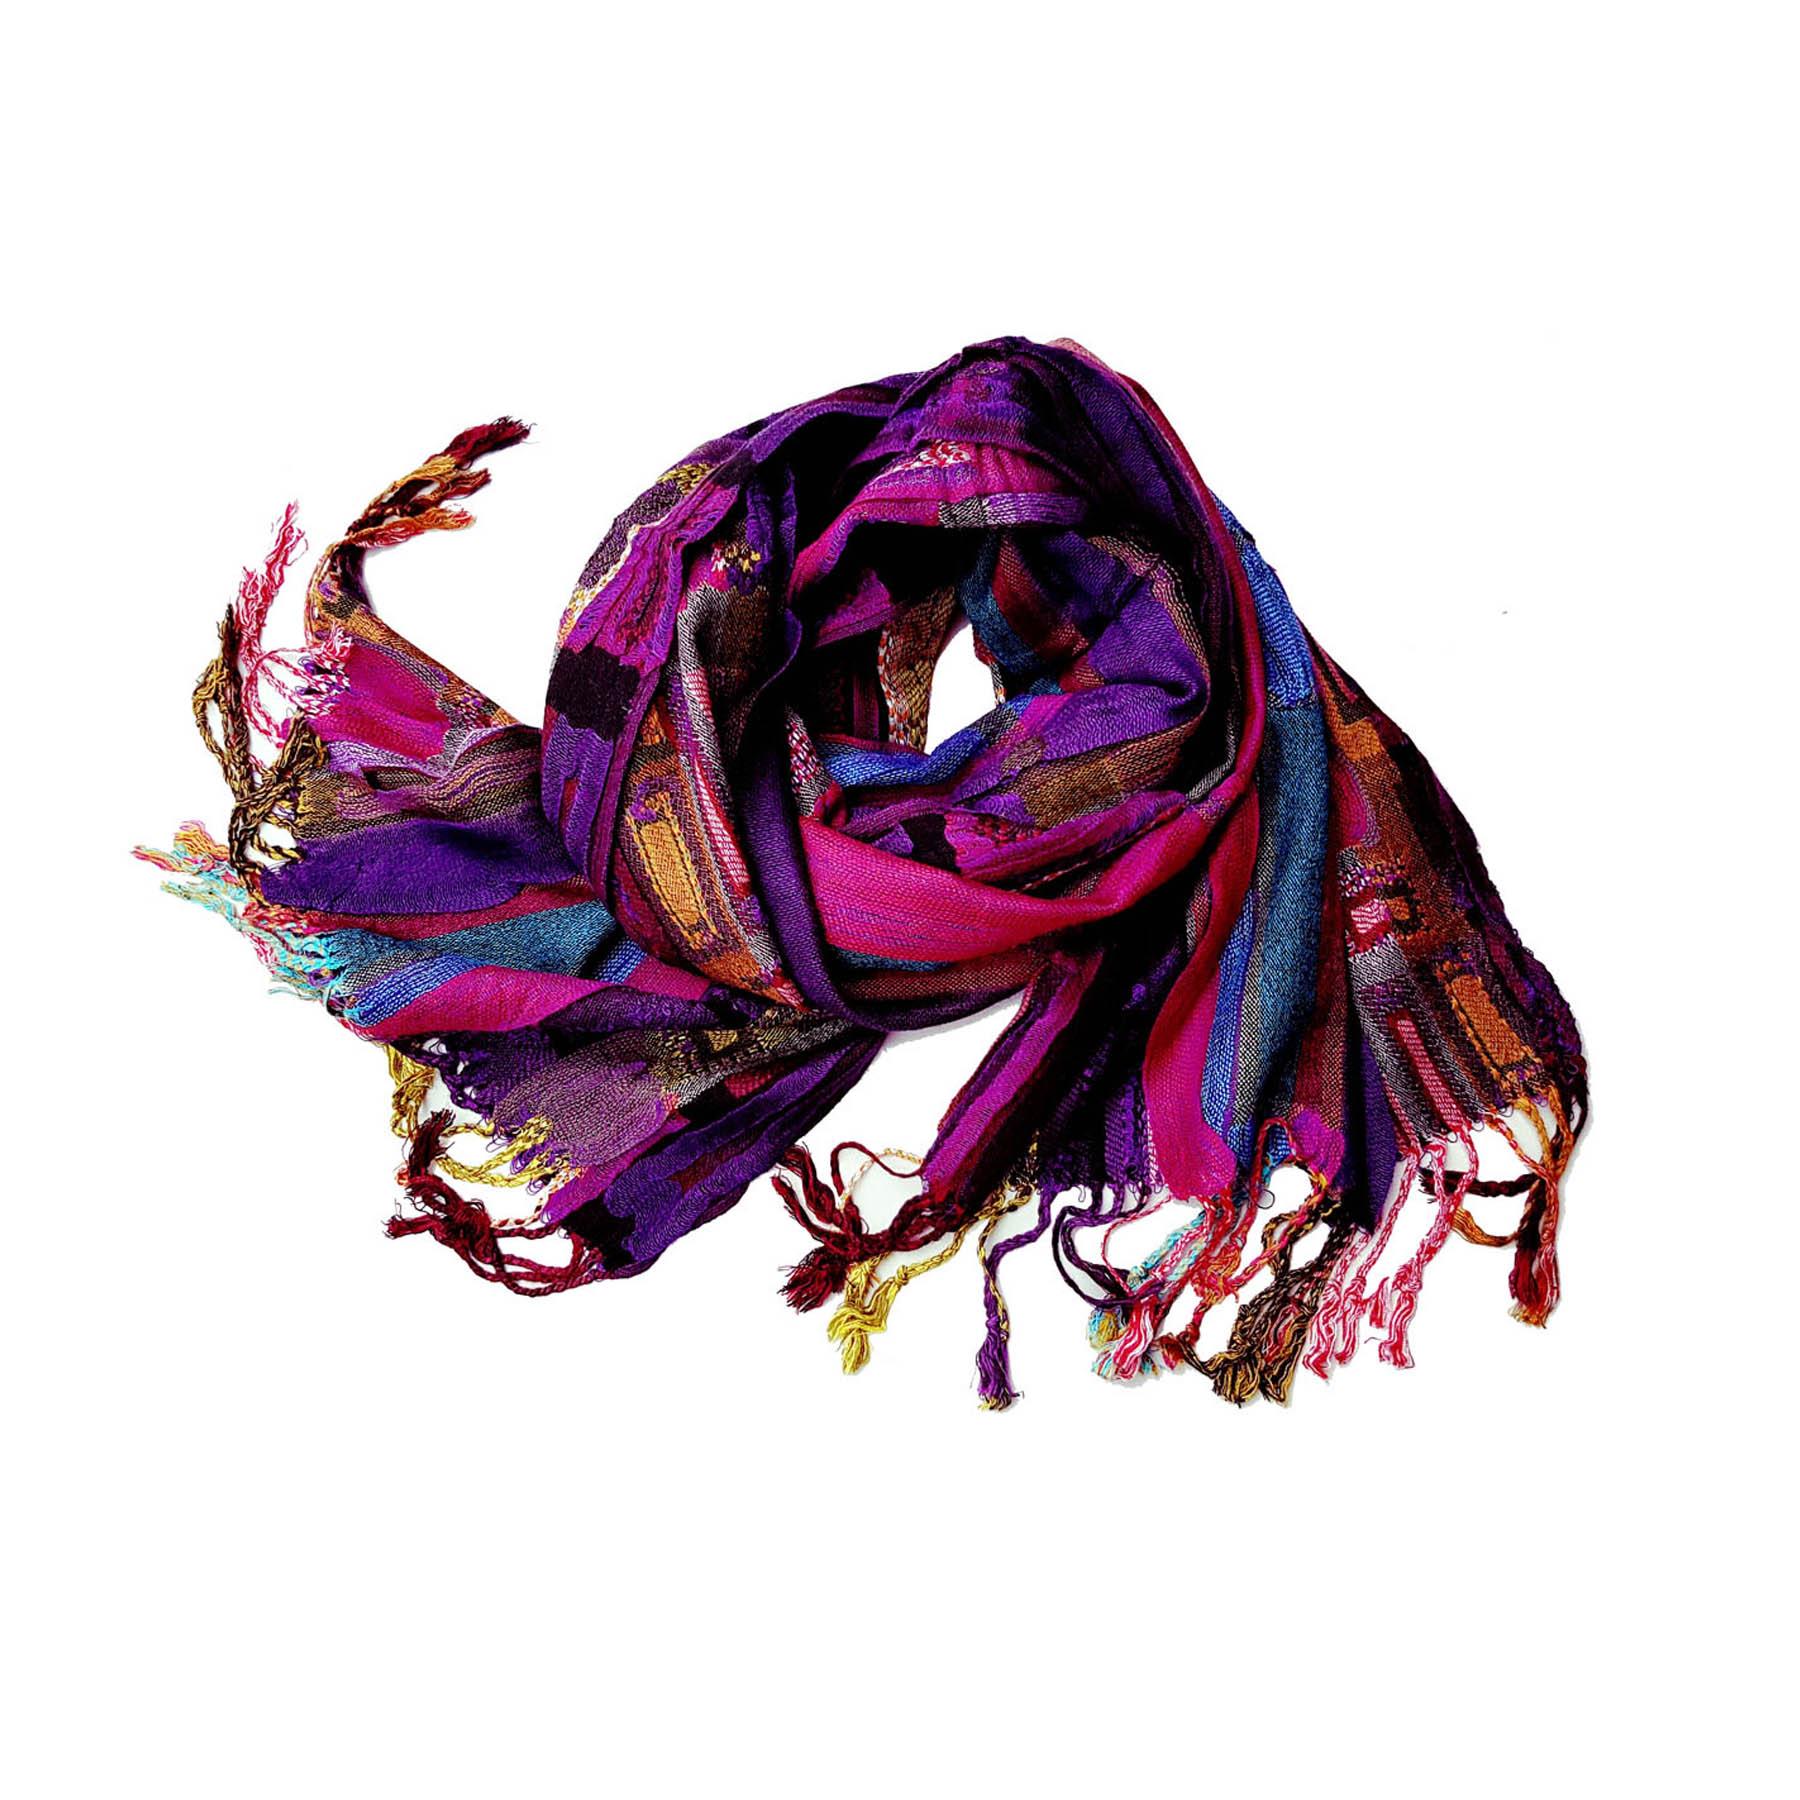 e112dbc8f1 SF-M-71-silk-caress-warm-winter-scarf-